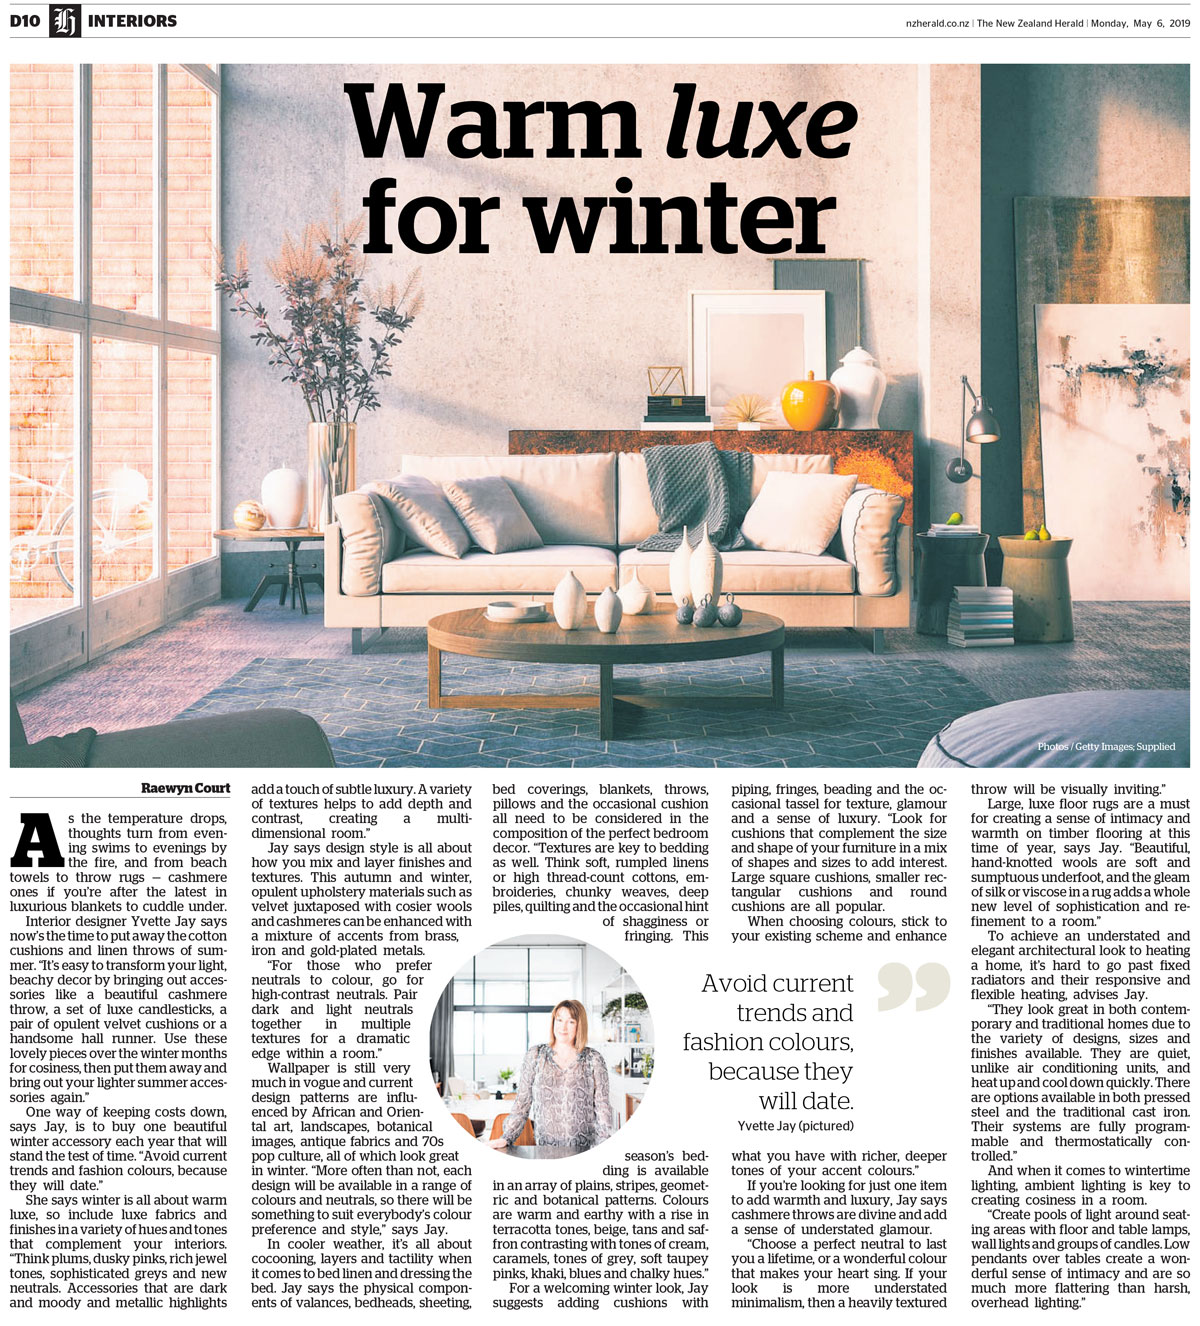 The NZ Herald — yvette jay